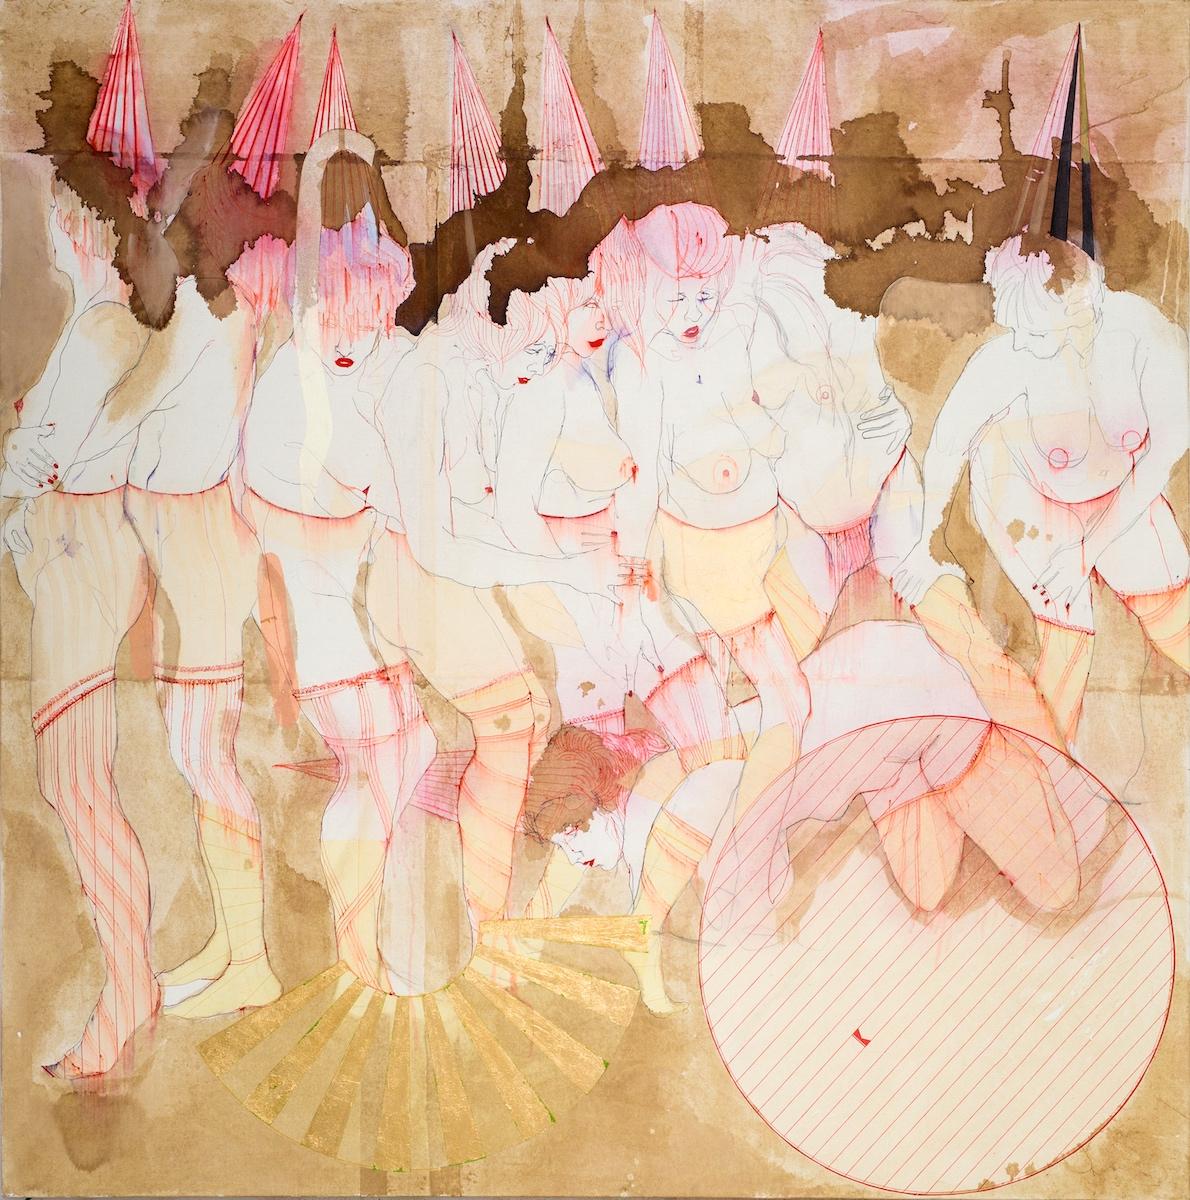 Elena Monzo, Cheerleading, 2017, tecnica mista su tela, cm 150x150